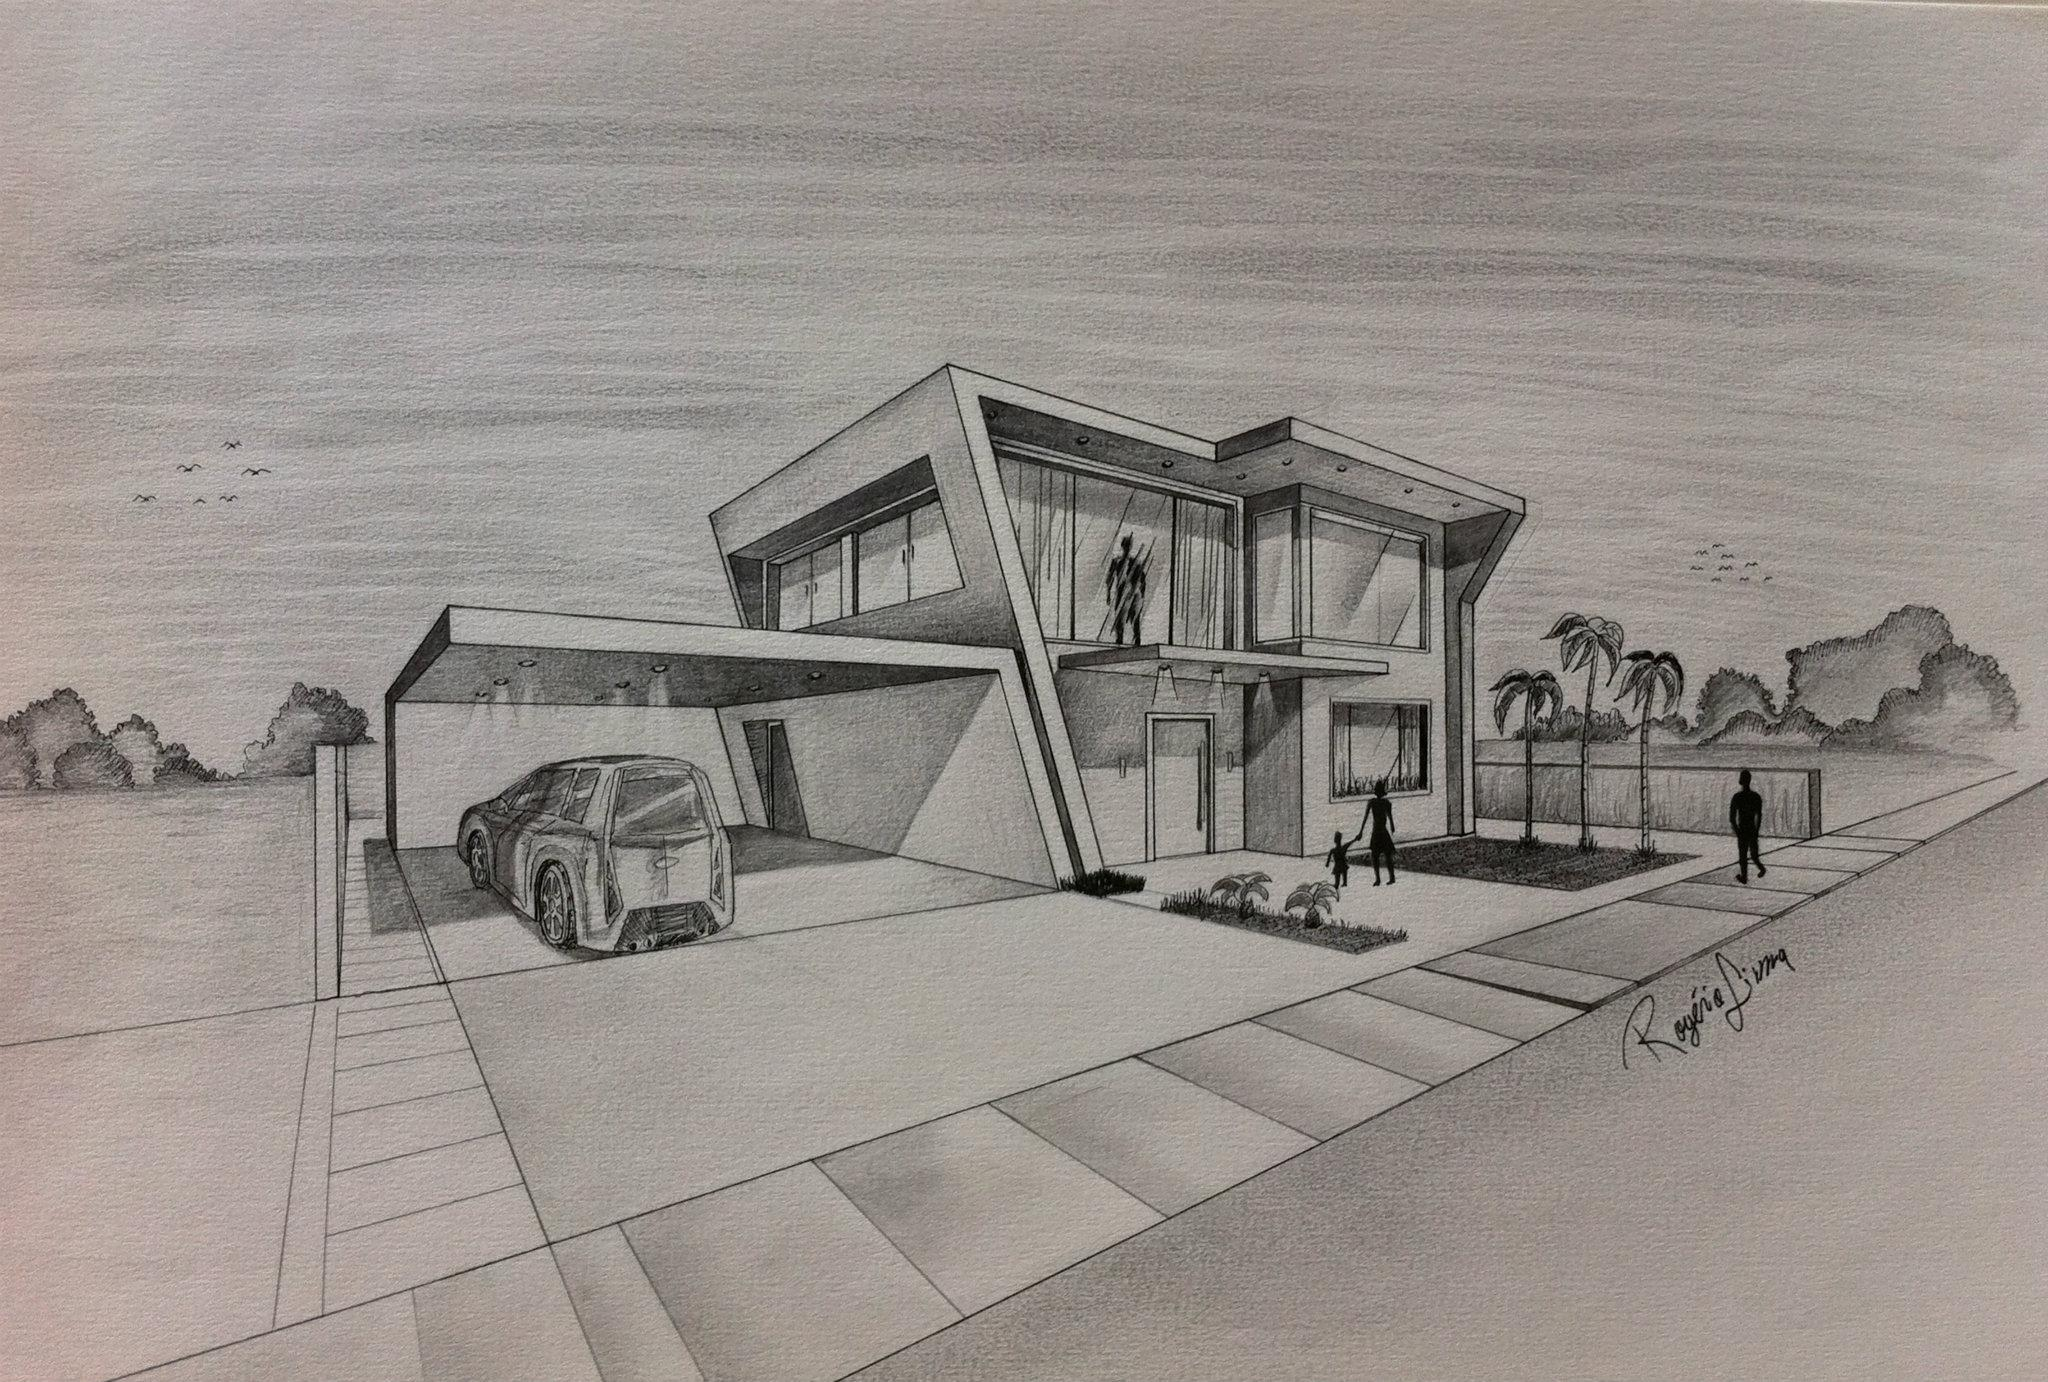 Drawn bulding  creative Simple Design House New Sketch